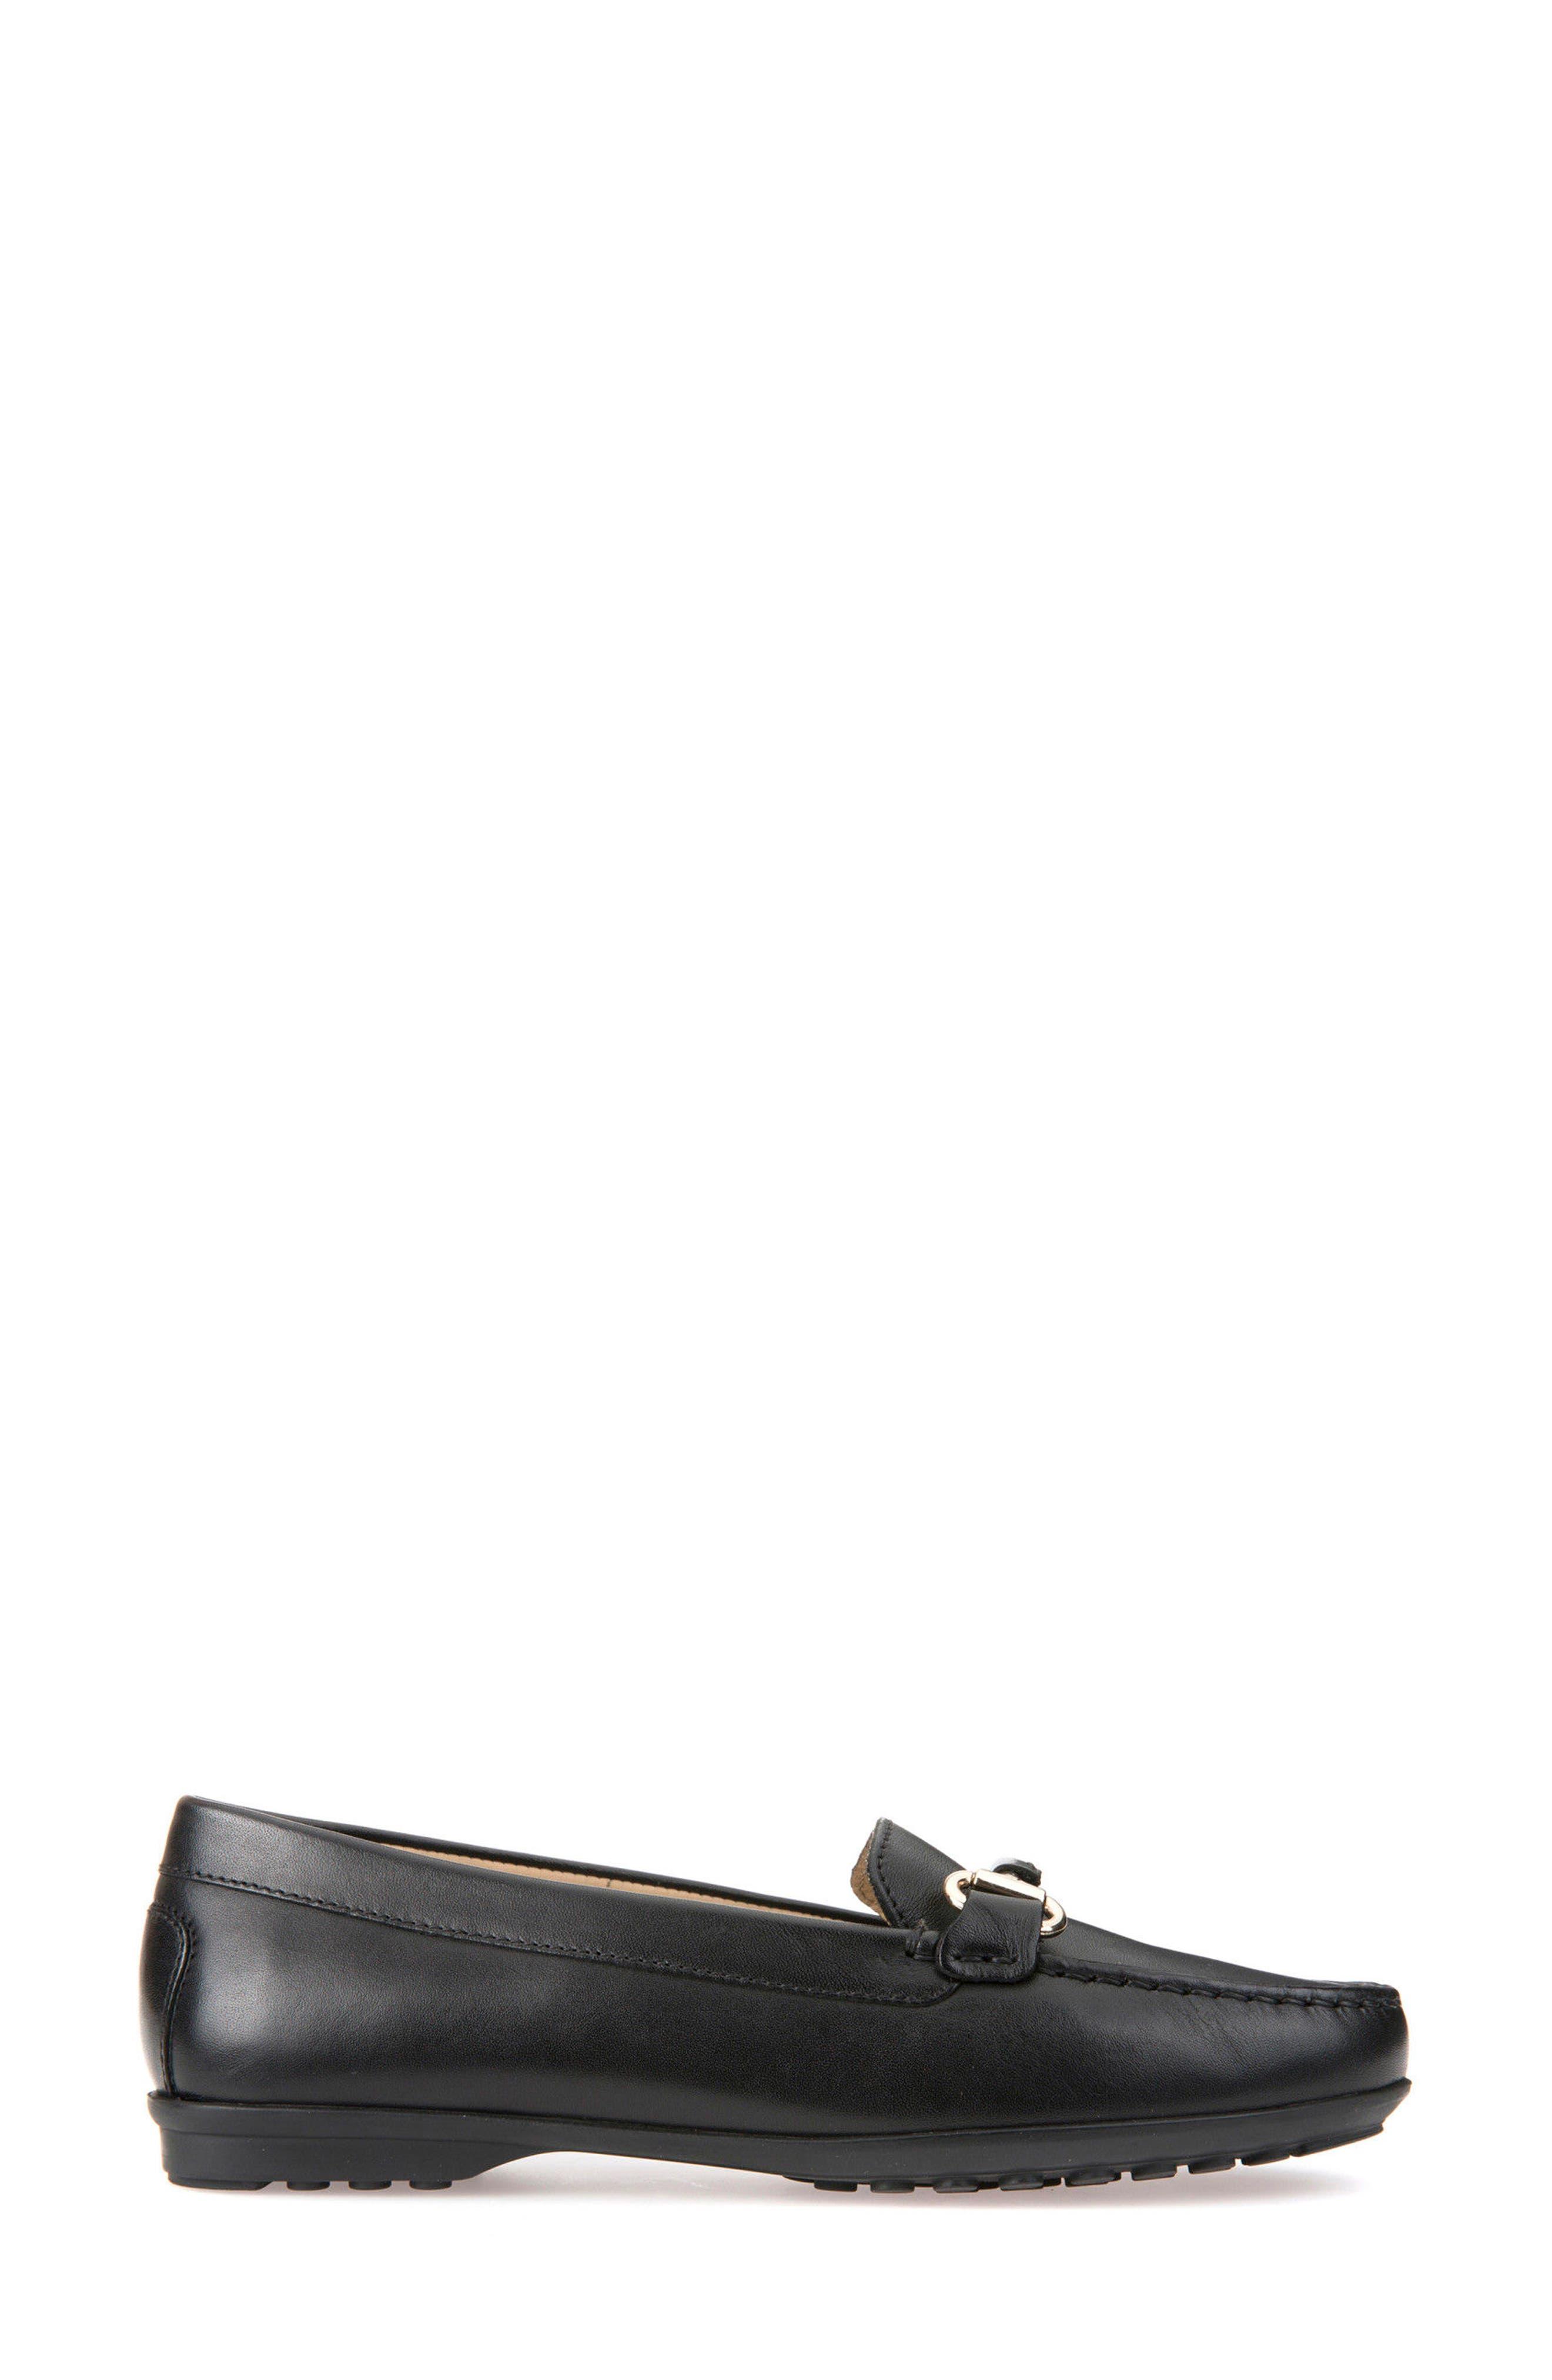 Elidia Buckle Loafer,                             Alternate thumbnail 3, color,                             Black Leather